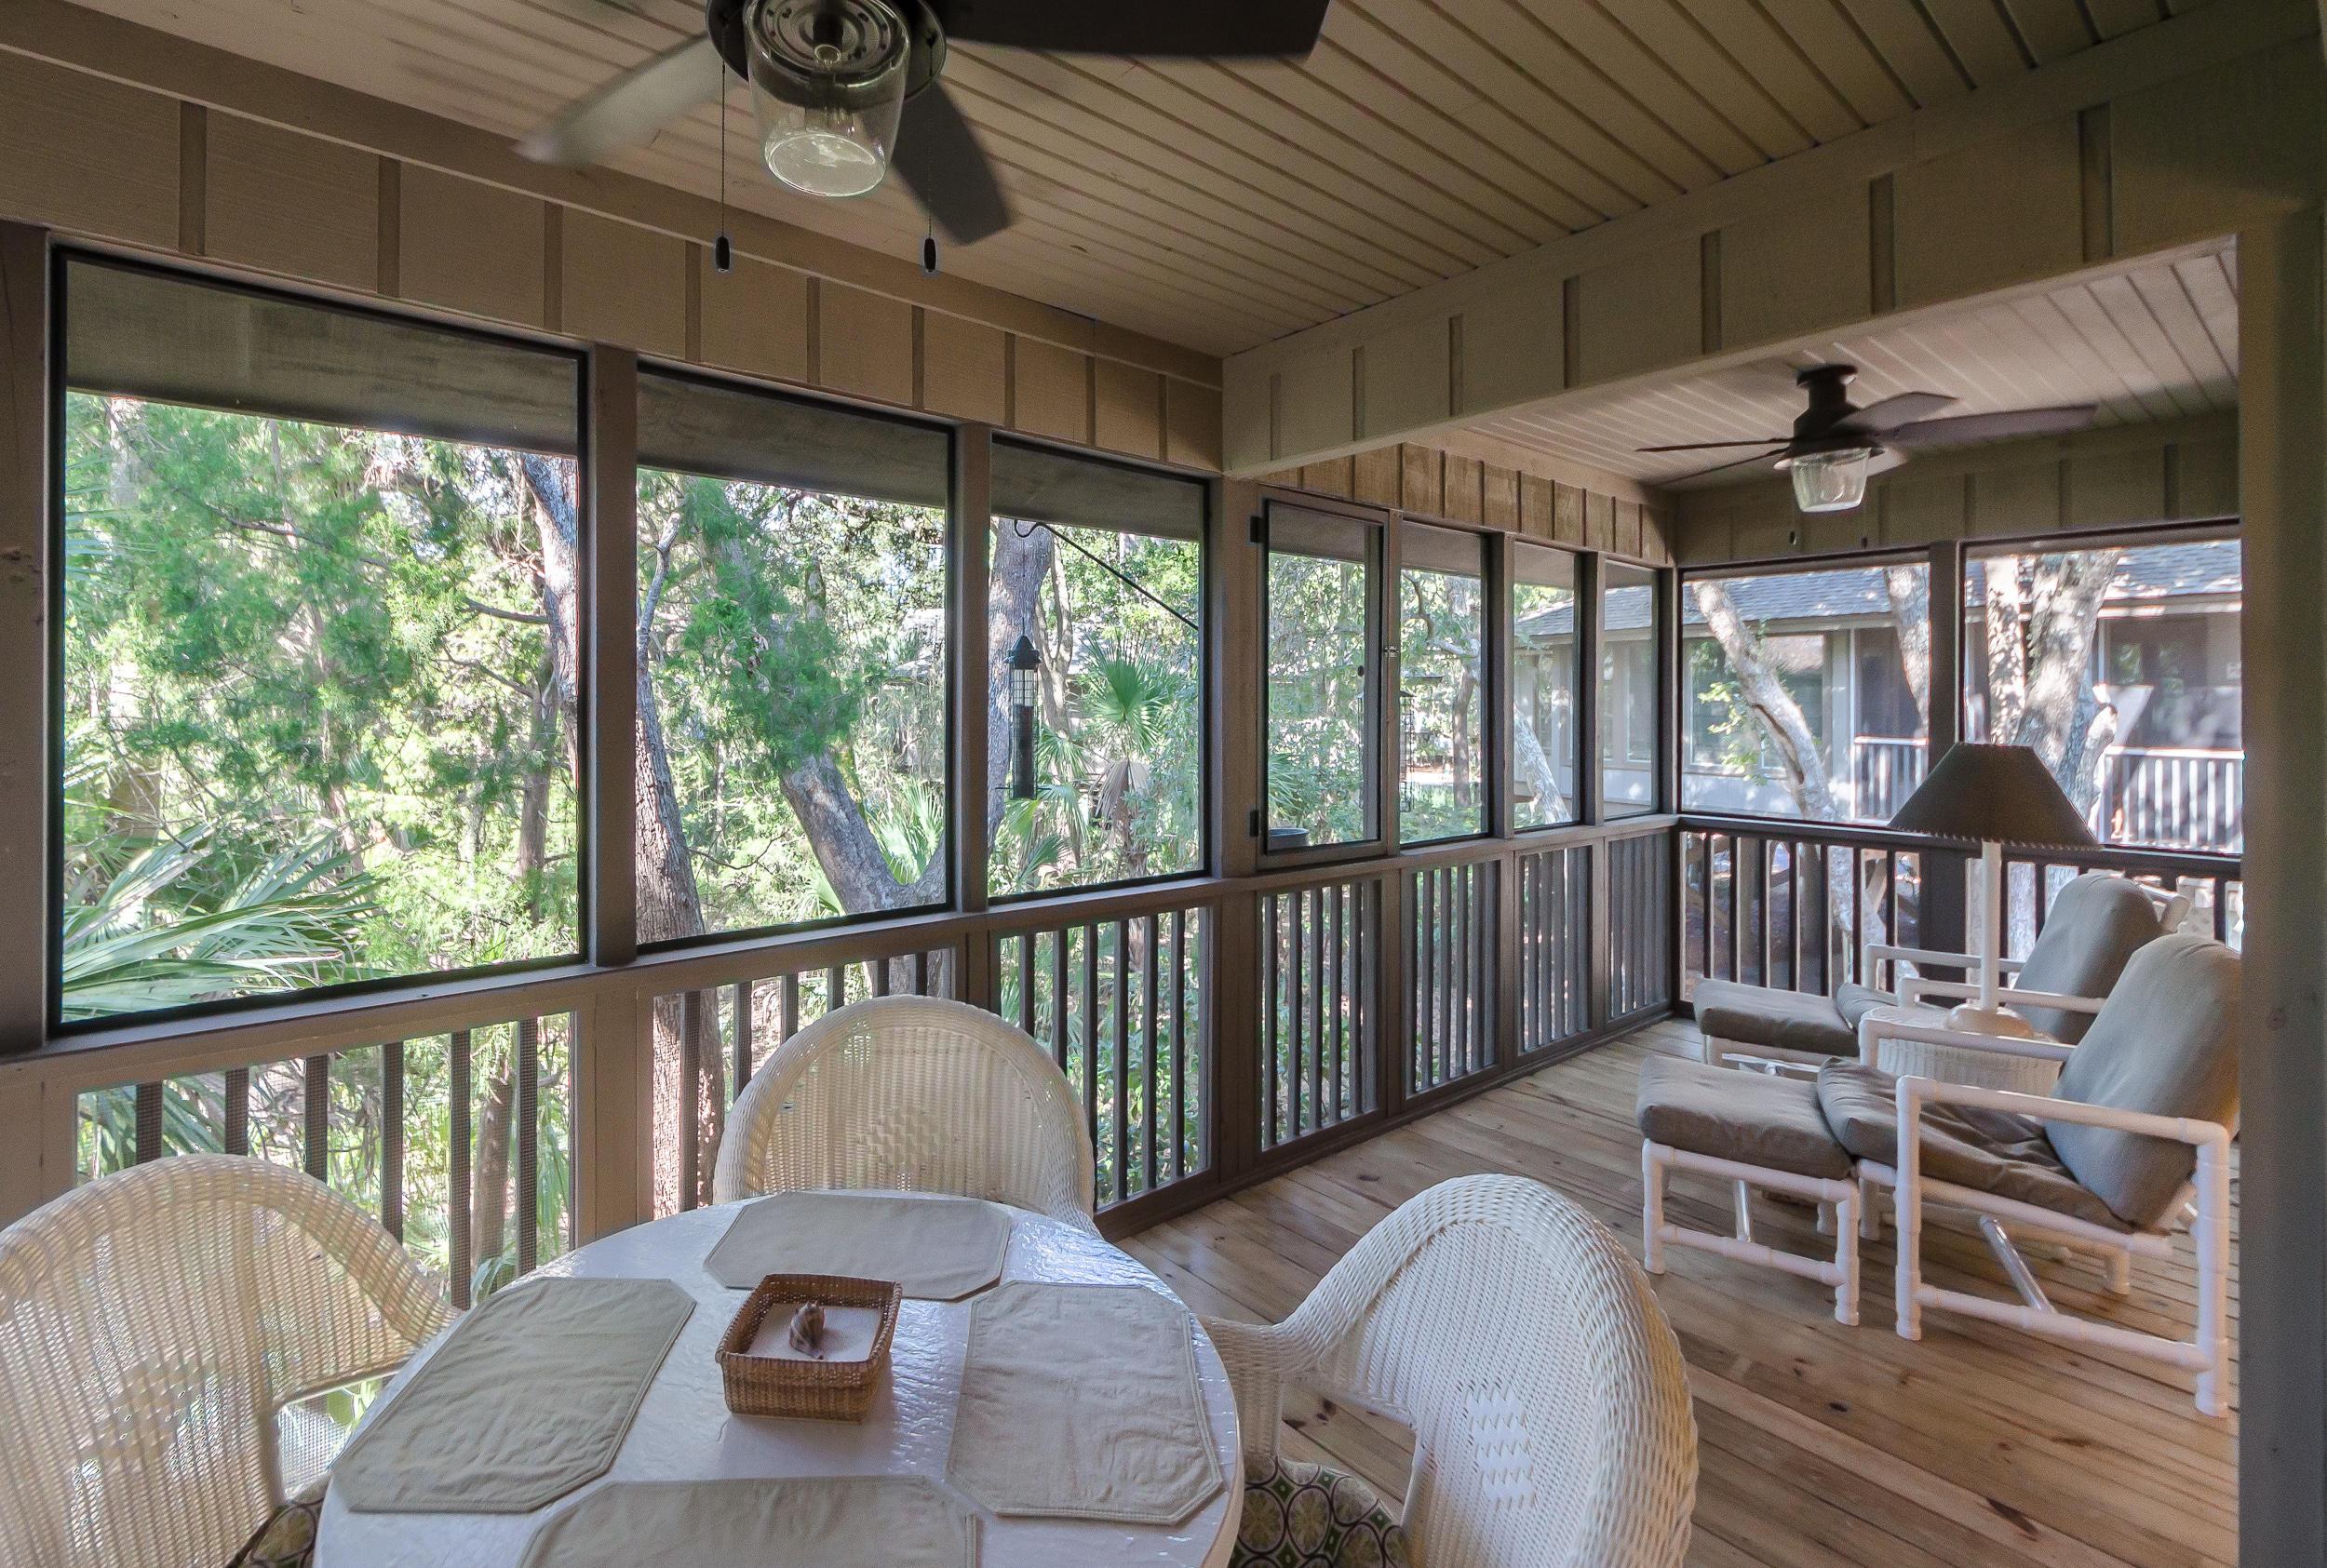 Kiawah Island Homes For Sale - 4186 Bald Pate, Kiawah Island, SC - 14